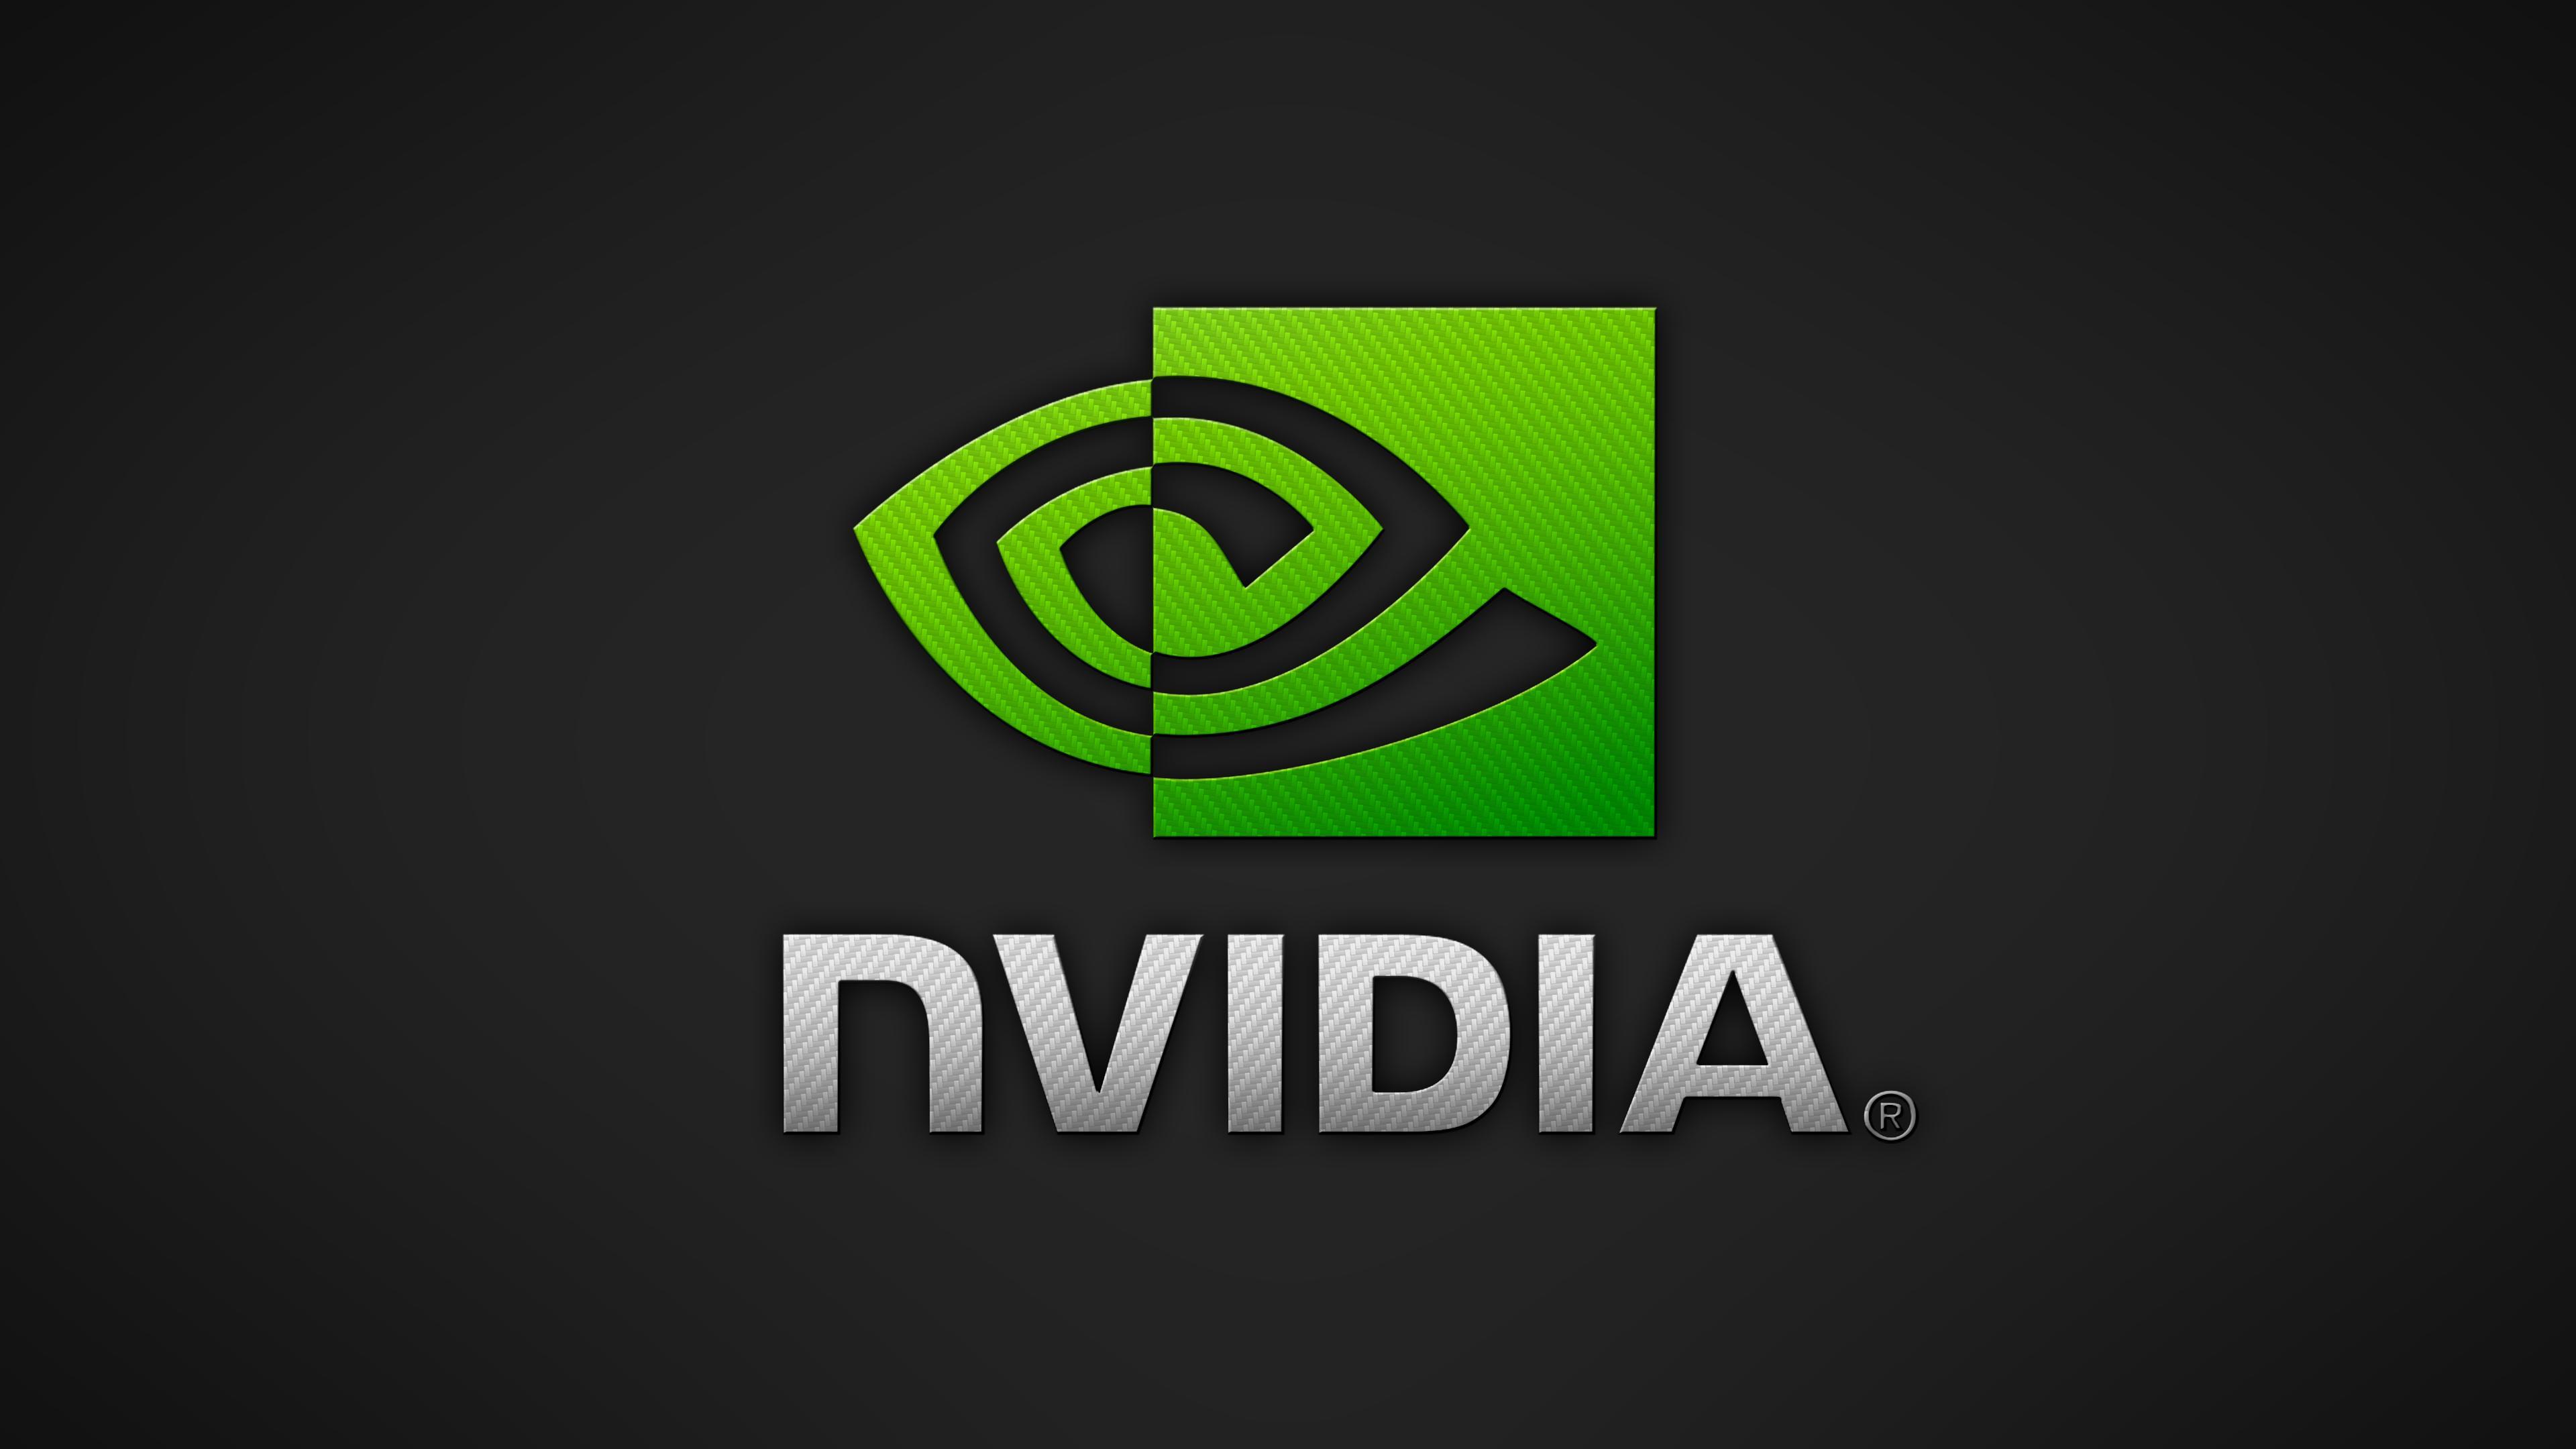 nvidia 1280x800 wallpaper car - photo #29